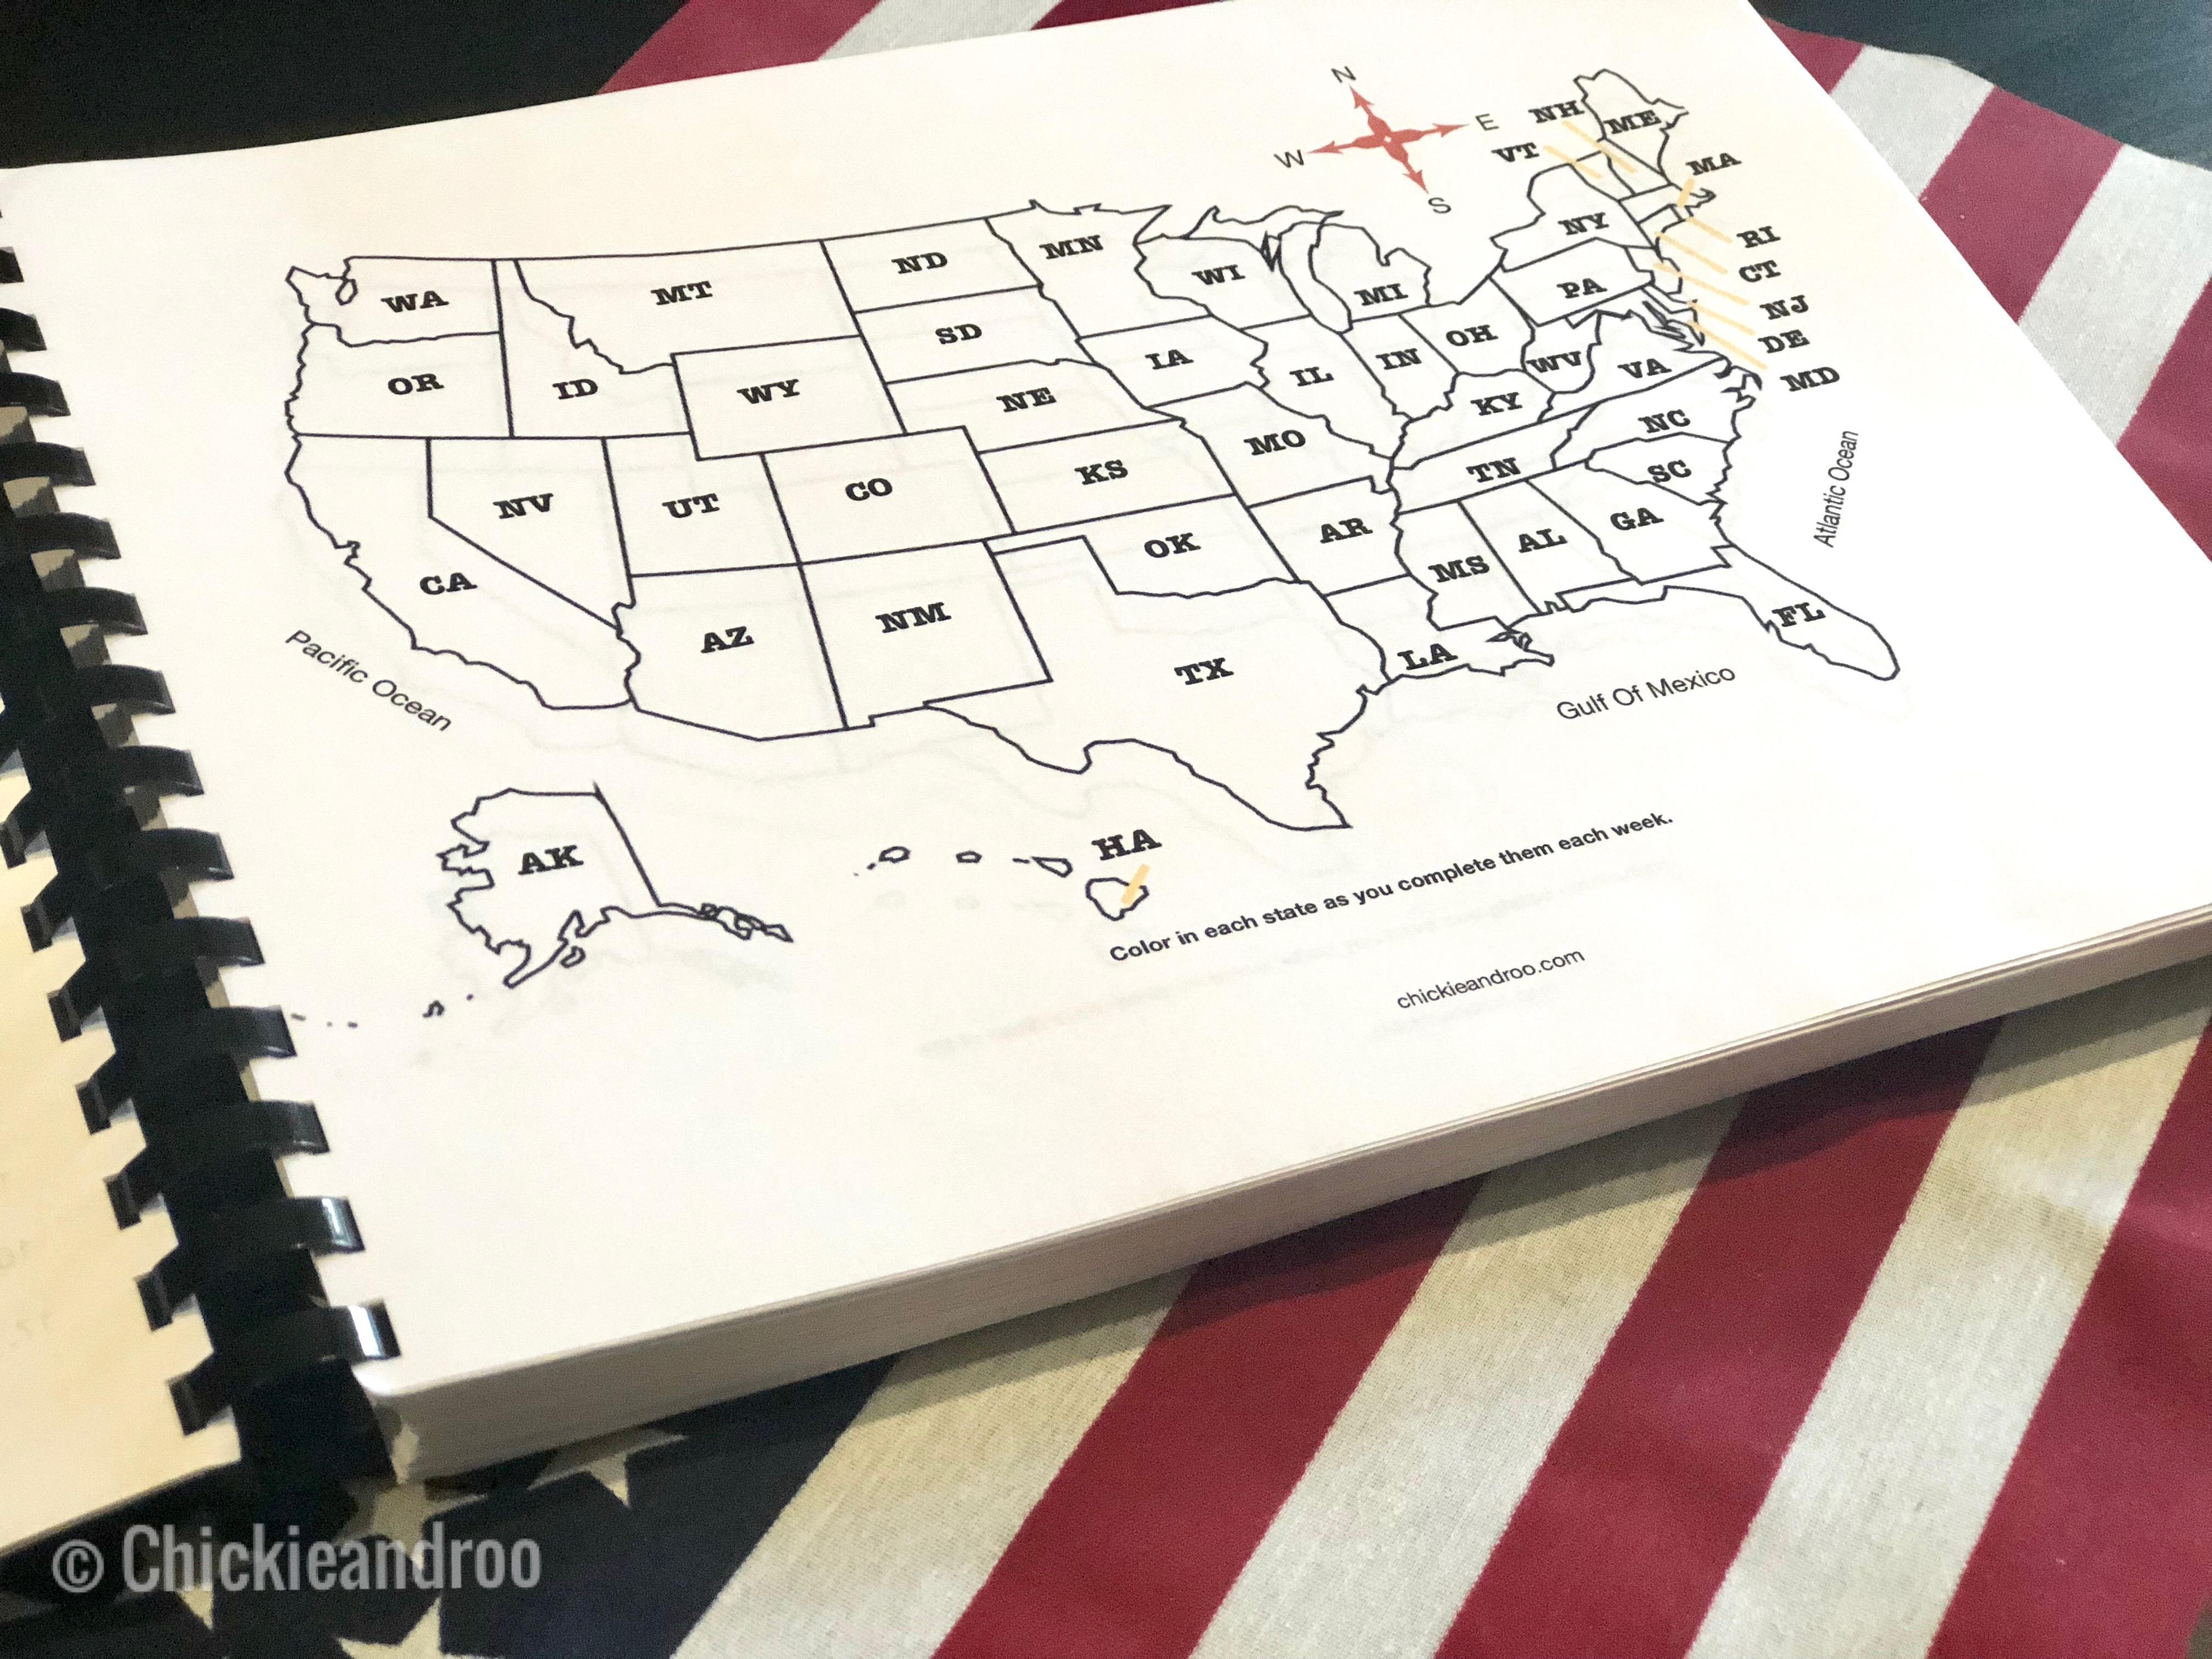 Steam States Curriculum Learn One State Per Week Through